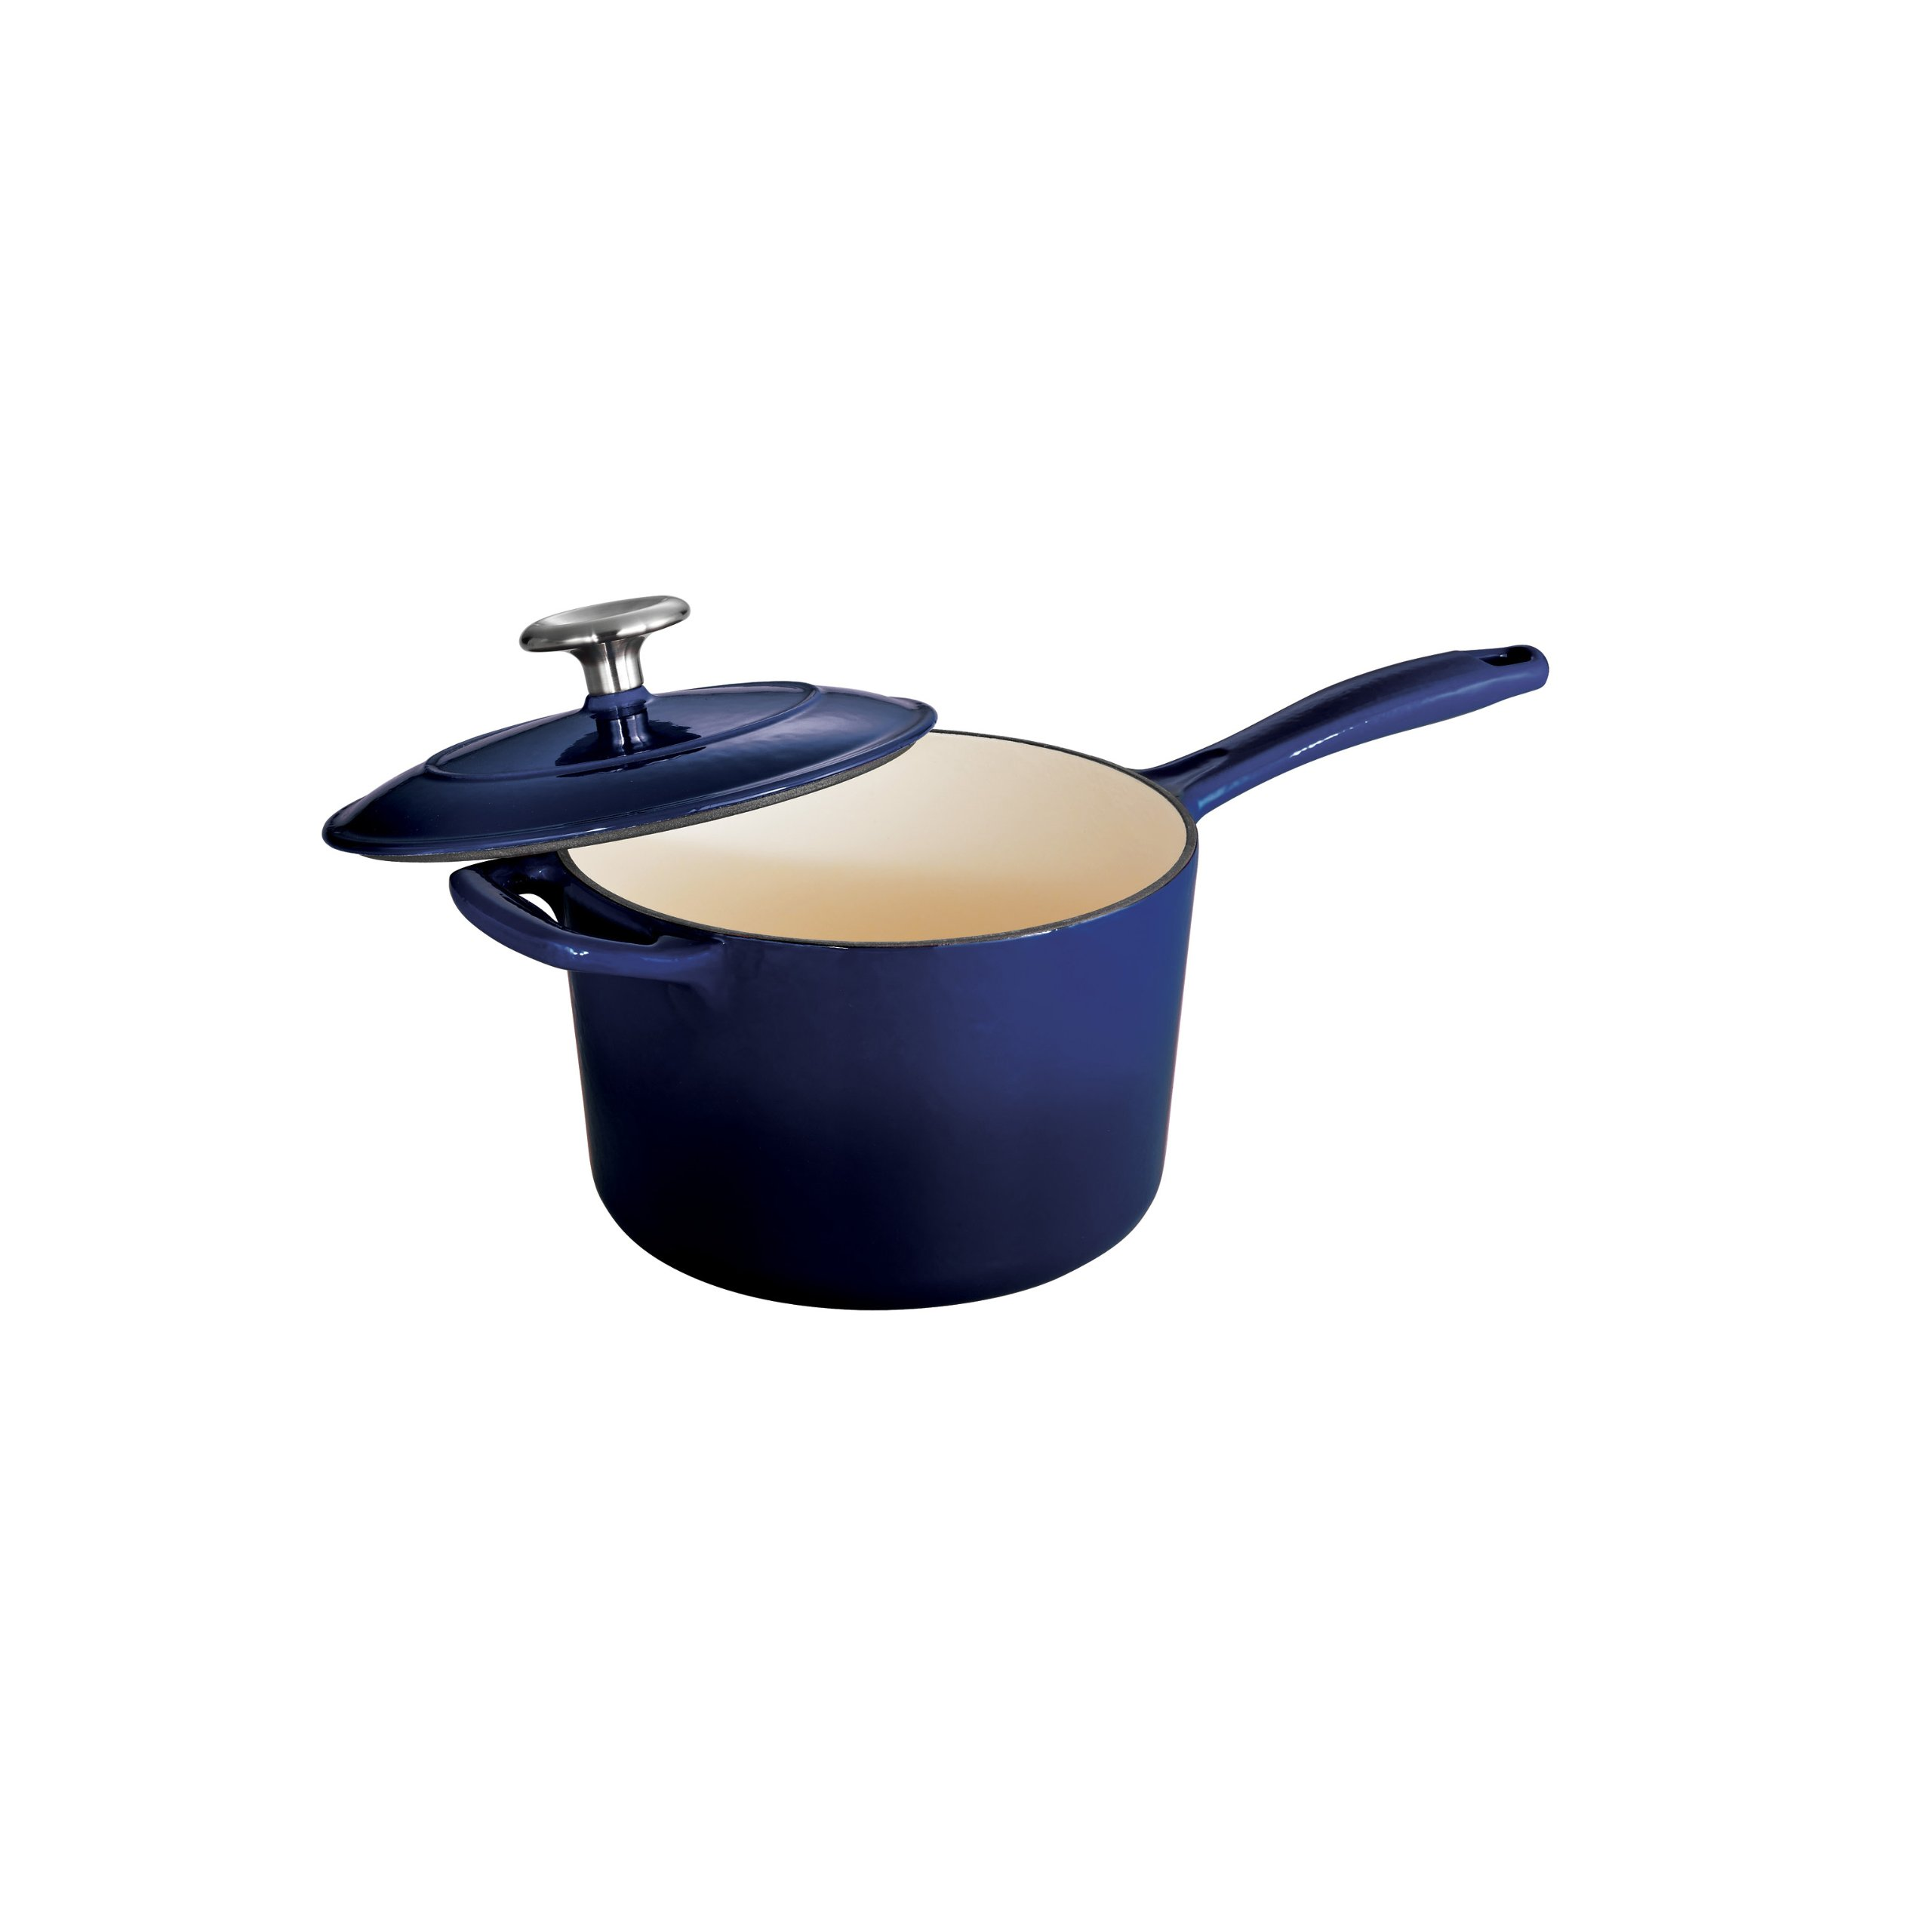 Tramontina Enameled Cast Iron Covered Sauce Pan, 2.5-Quart, Gradated Cobalt by Tramontina (Image #1)